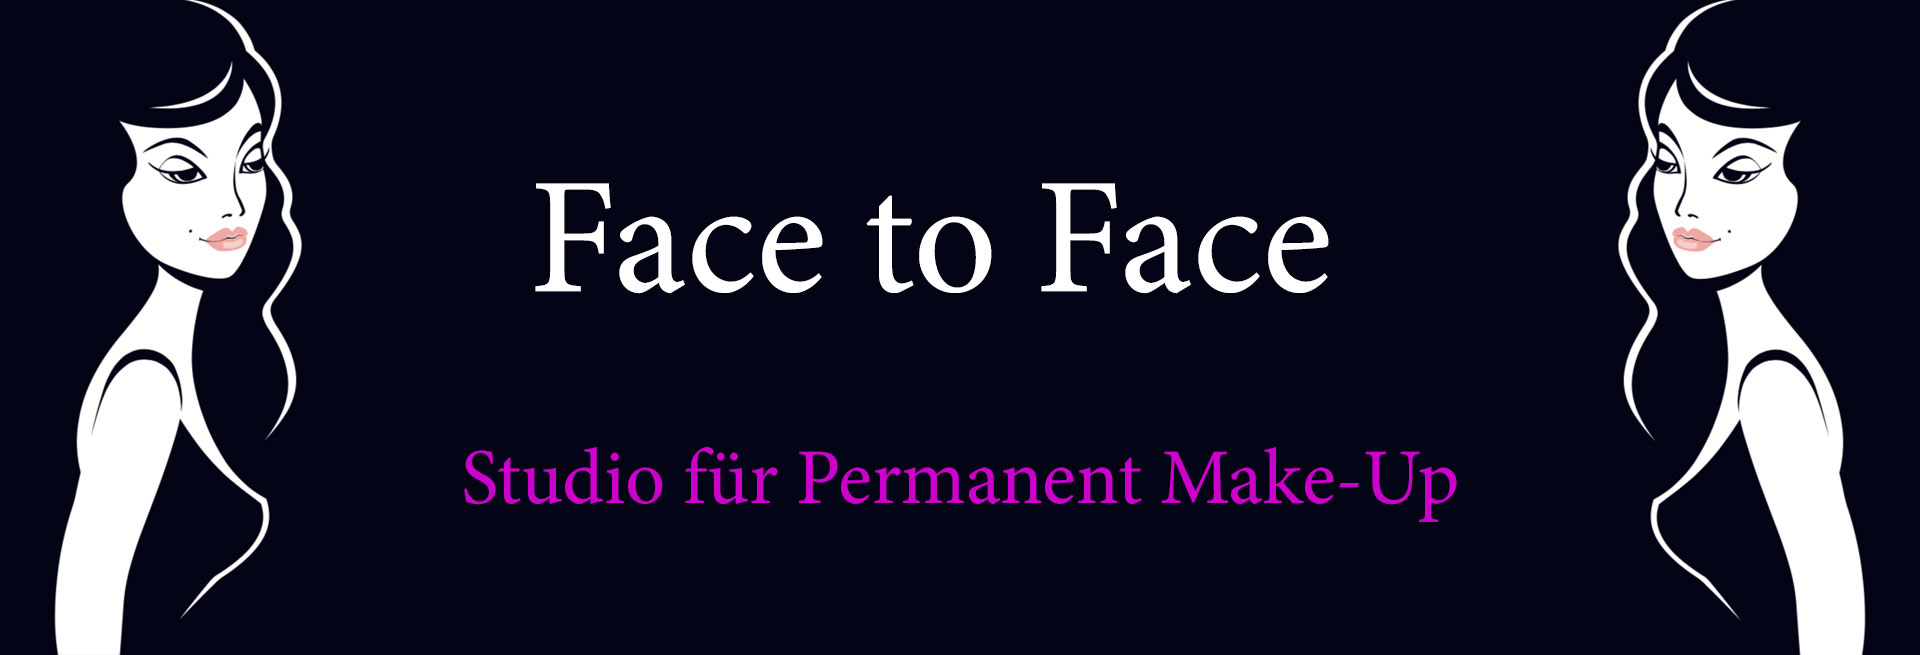 Headerbild-FacetoFace